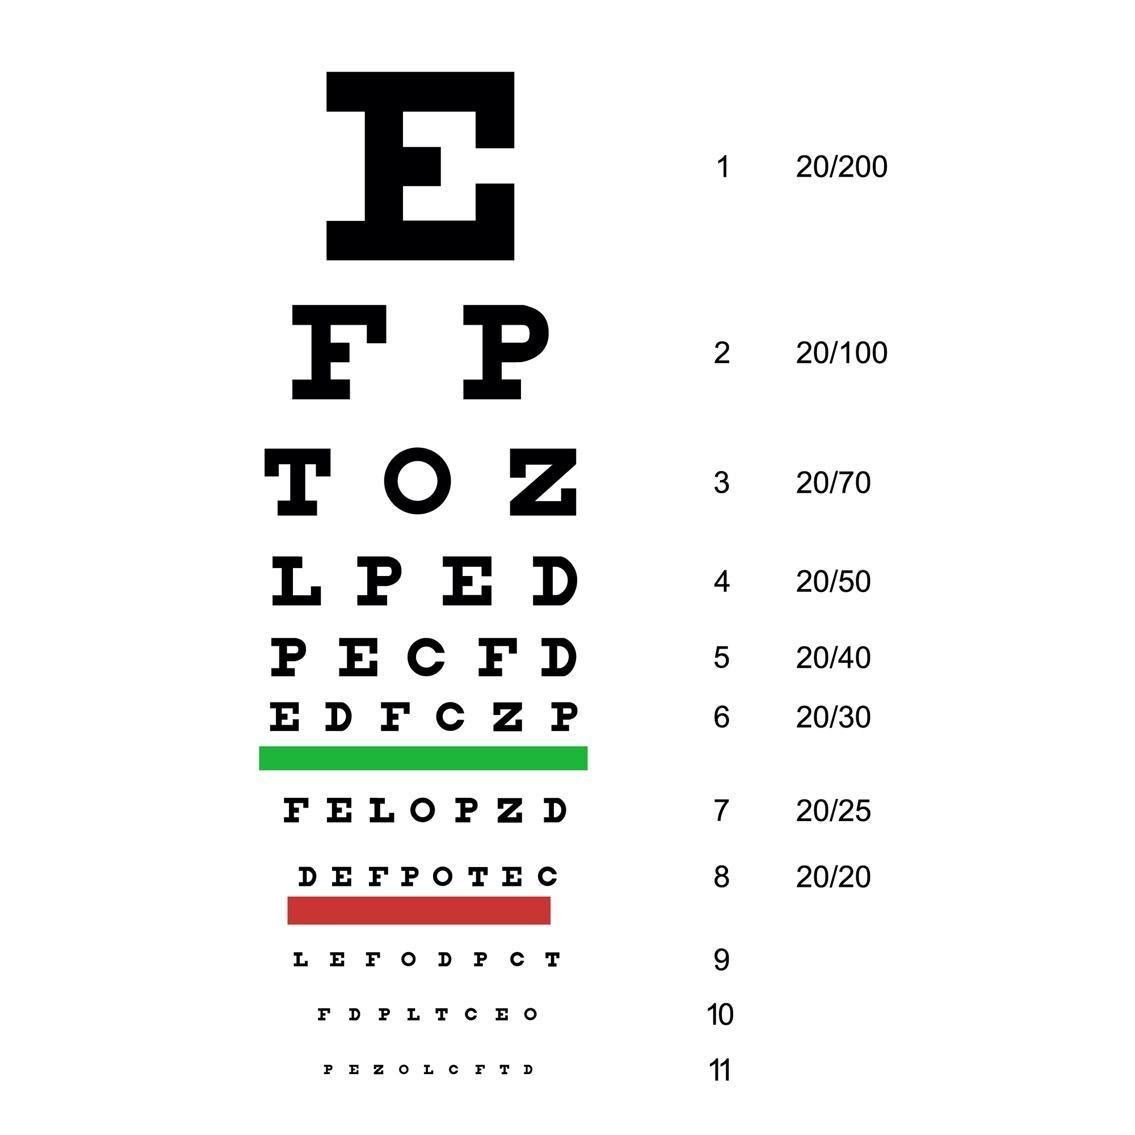 eye chart 20/20 vision